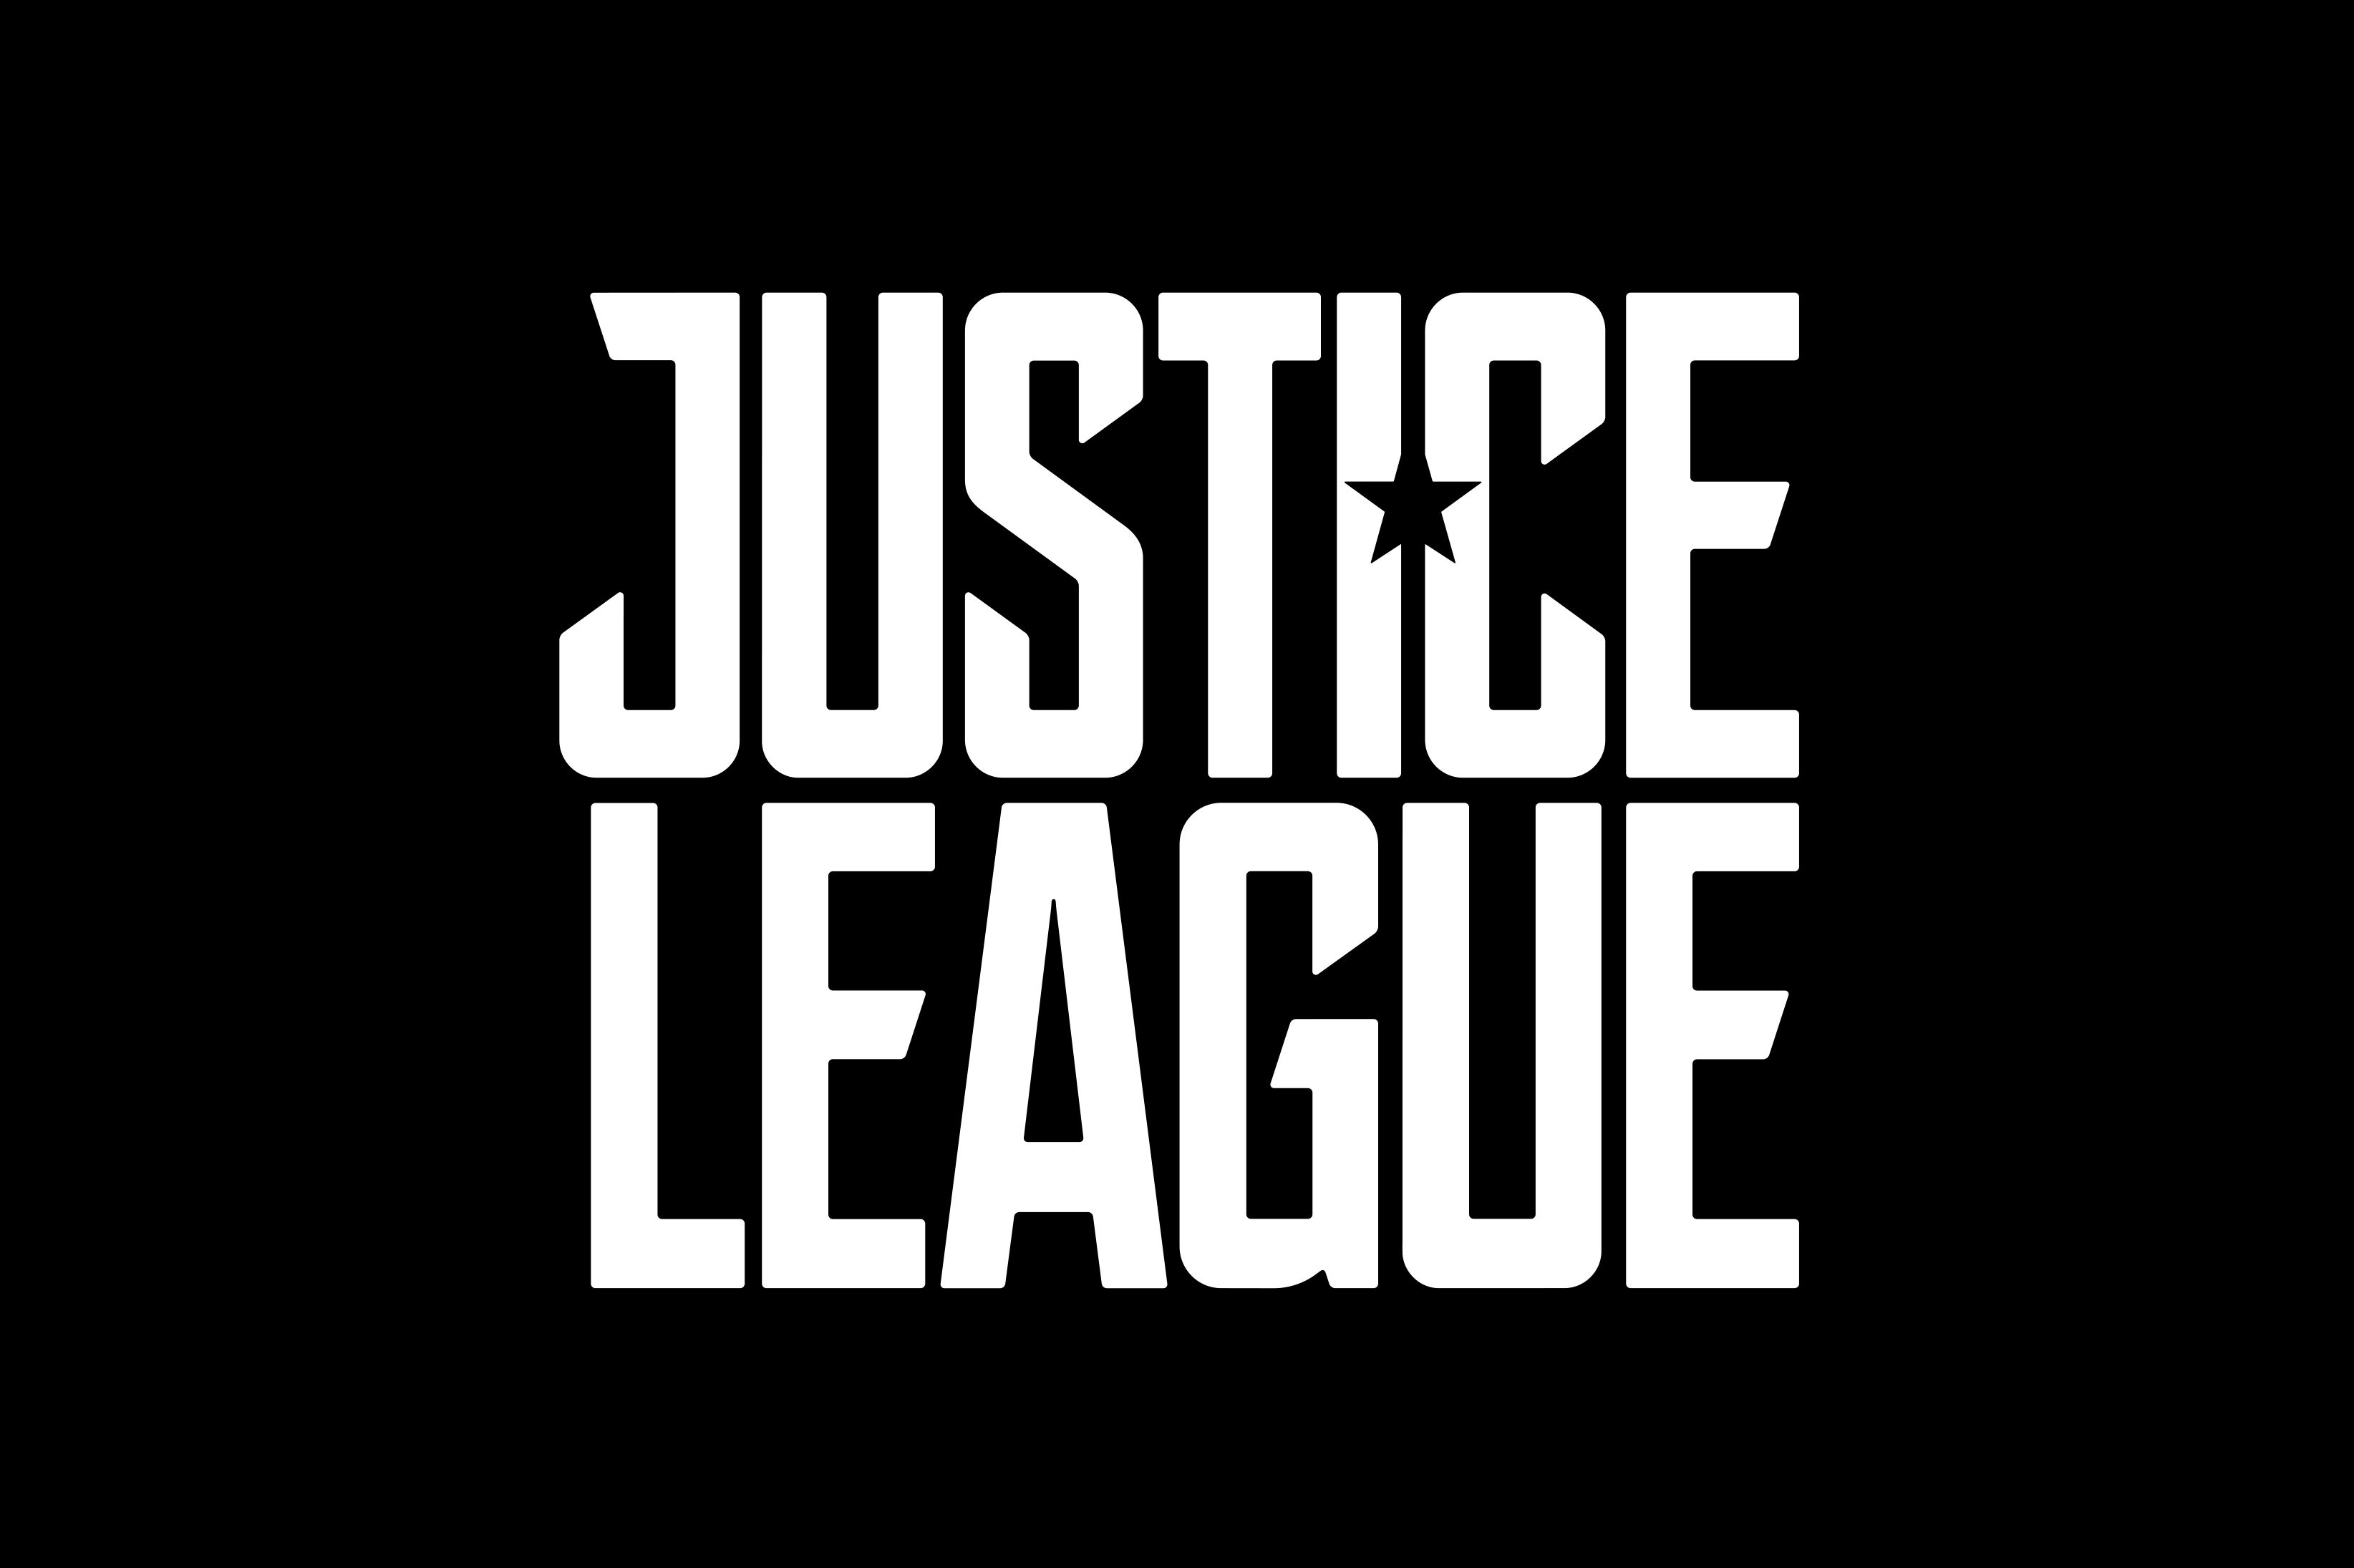 Justice-League-Movie-Logo-Black-BG.jpg